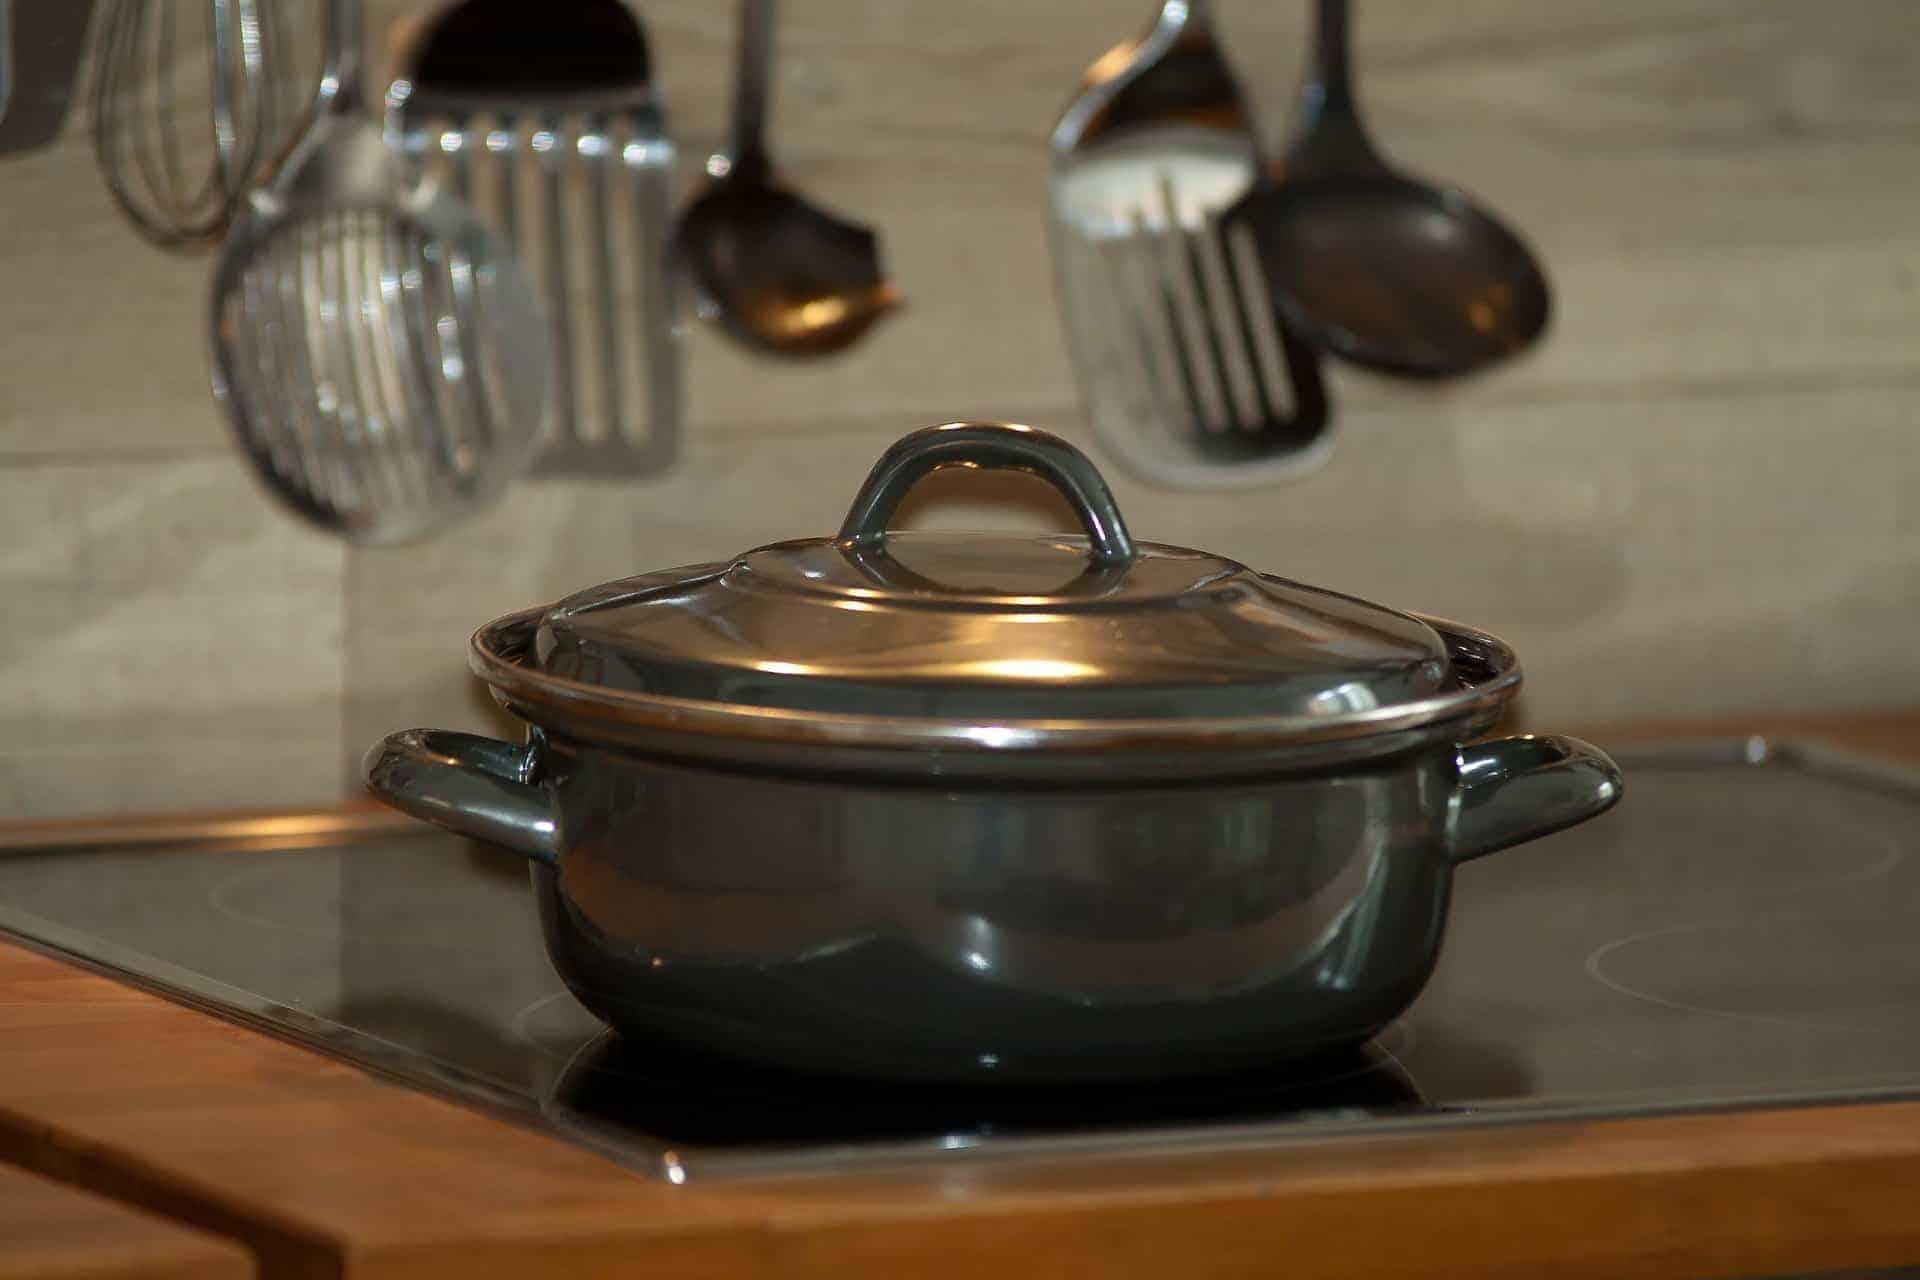 Gray saucepan